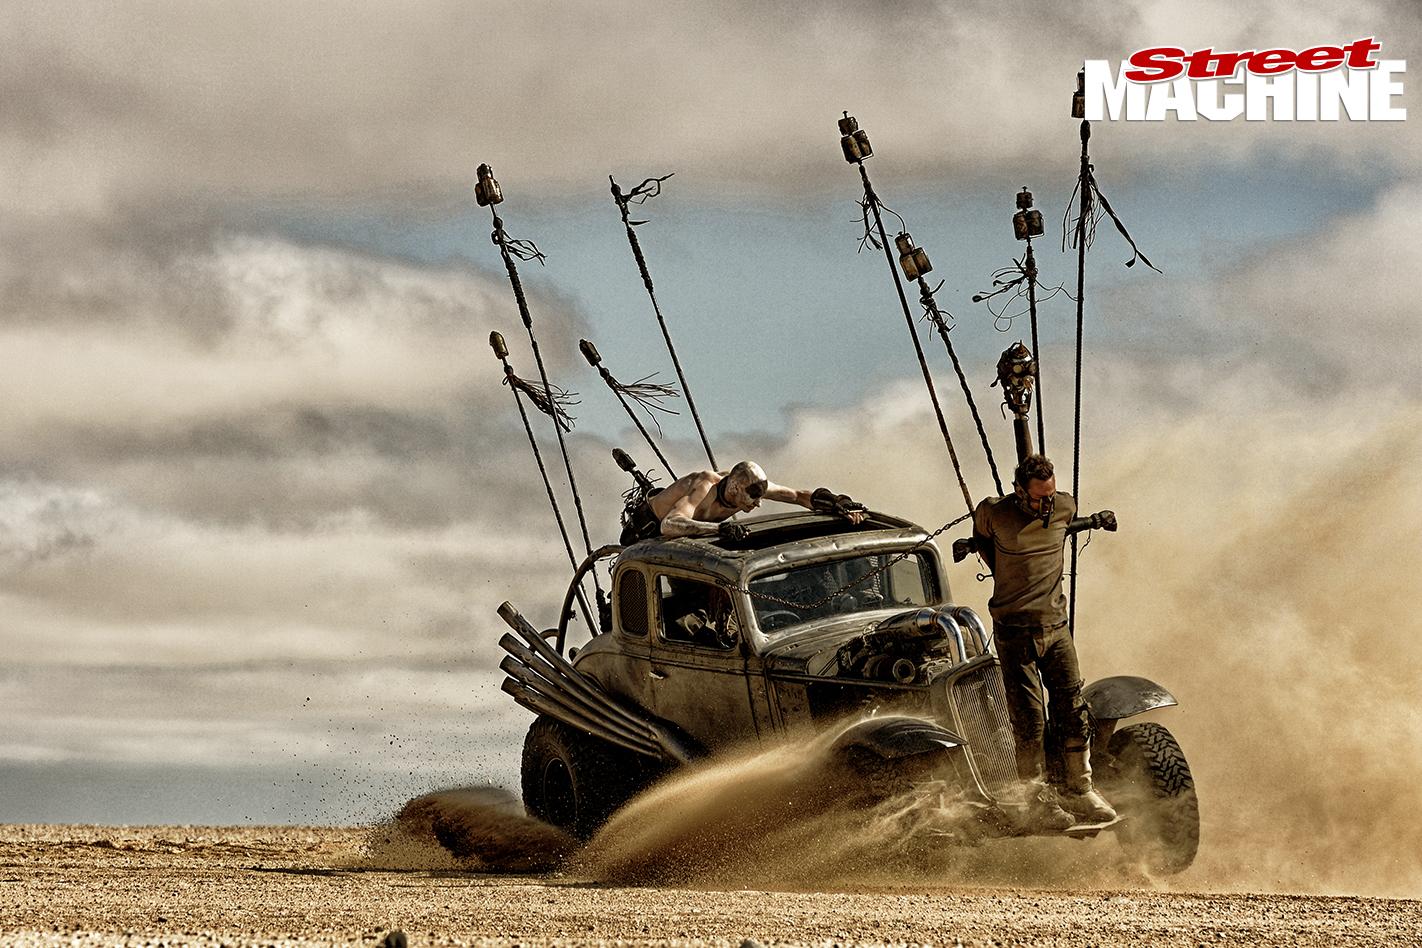 Mad -max -fury -road -20